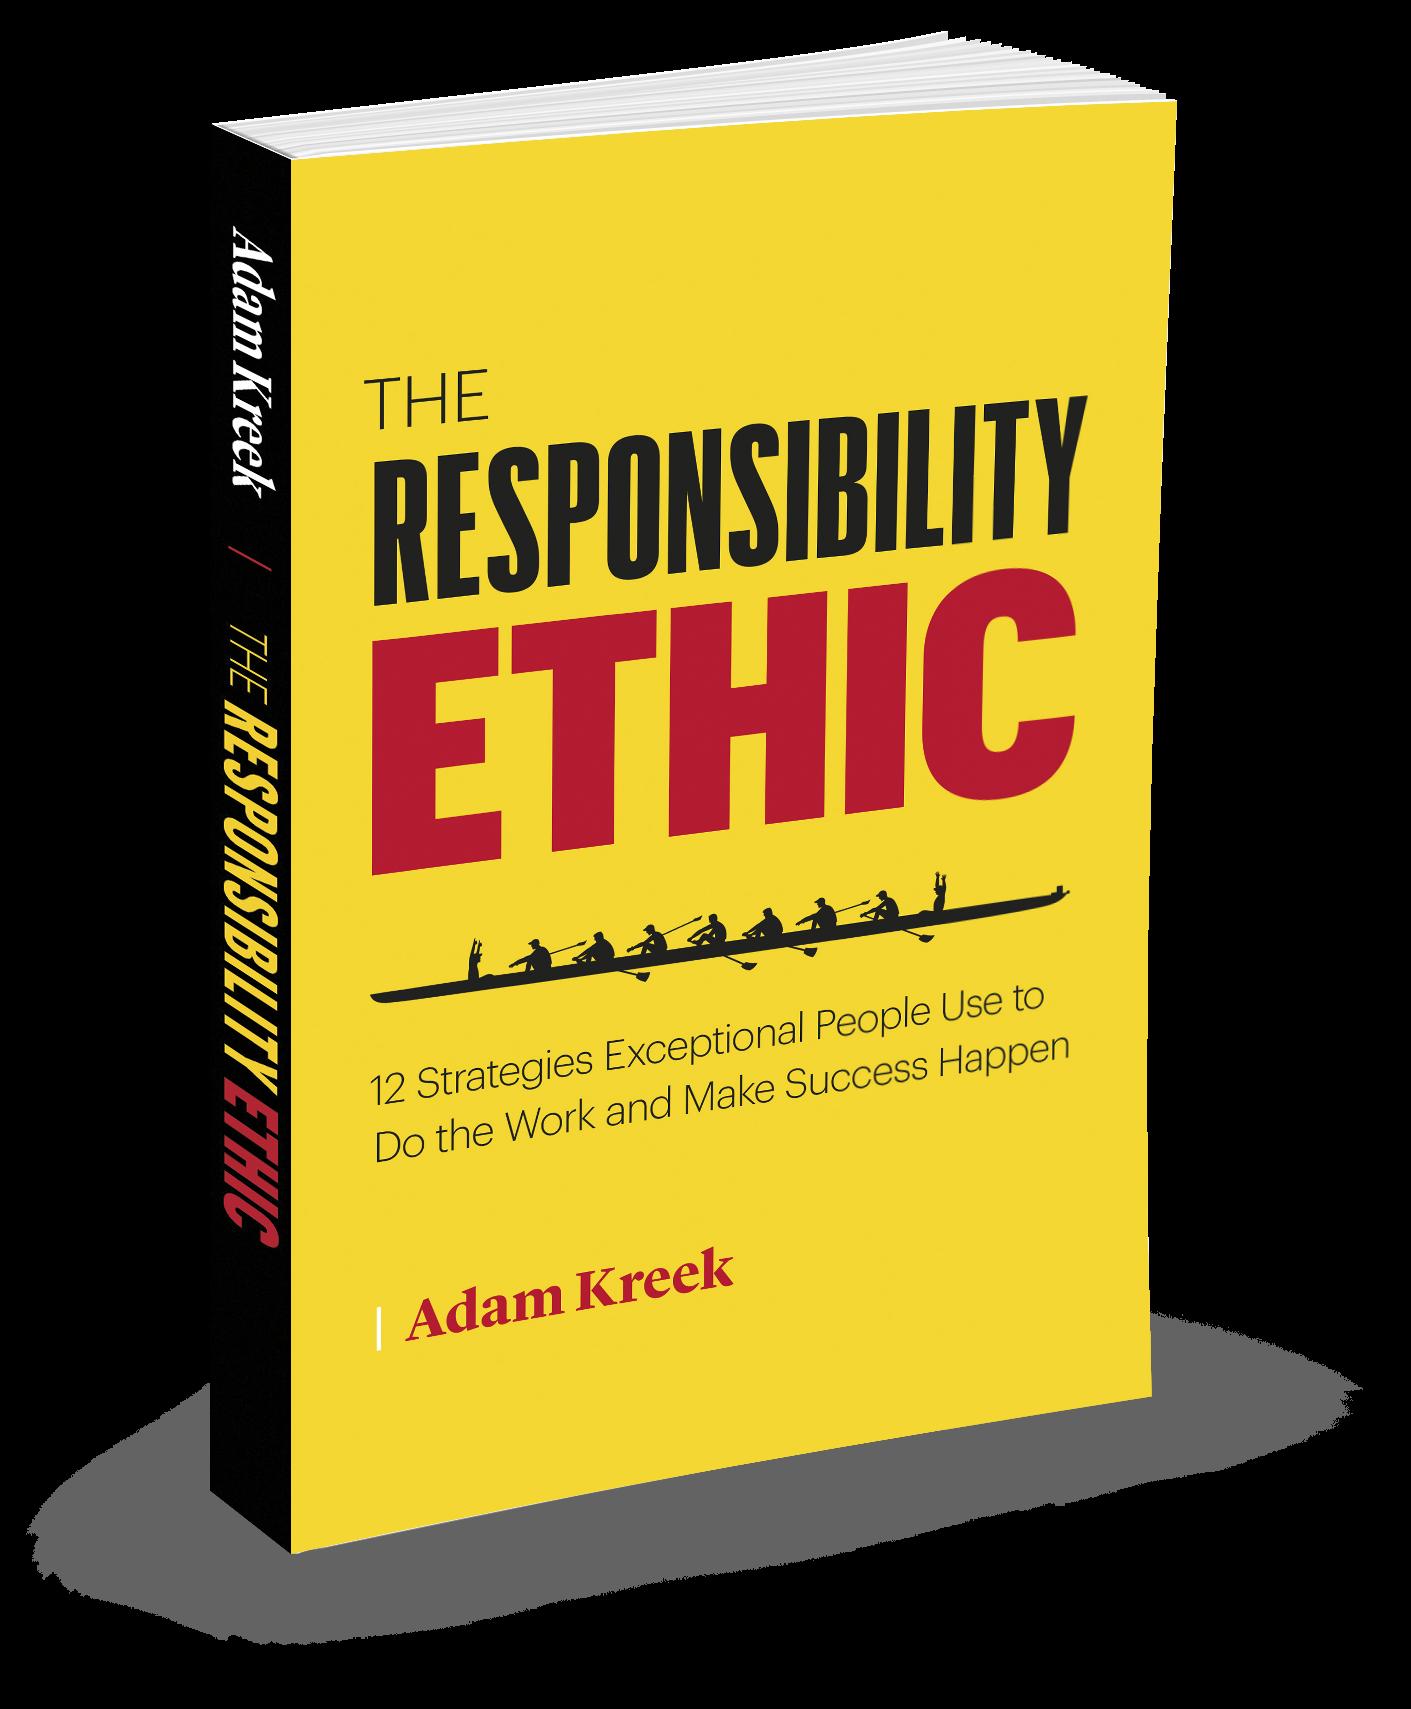 The Responsibility Ethic - Adam Kreek